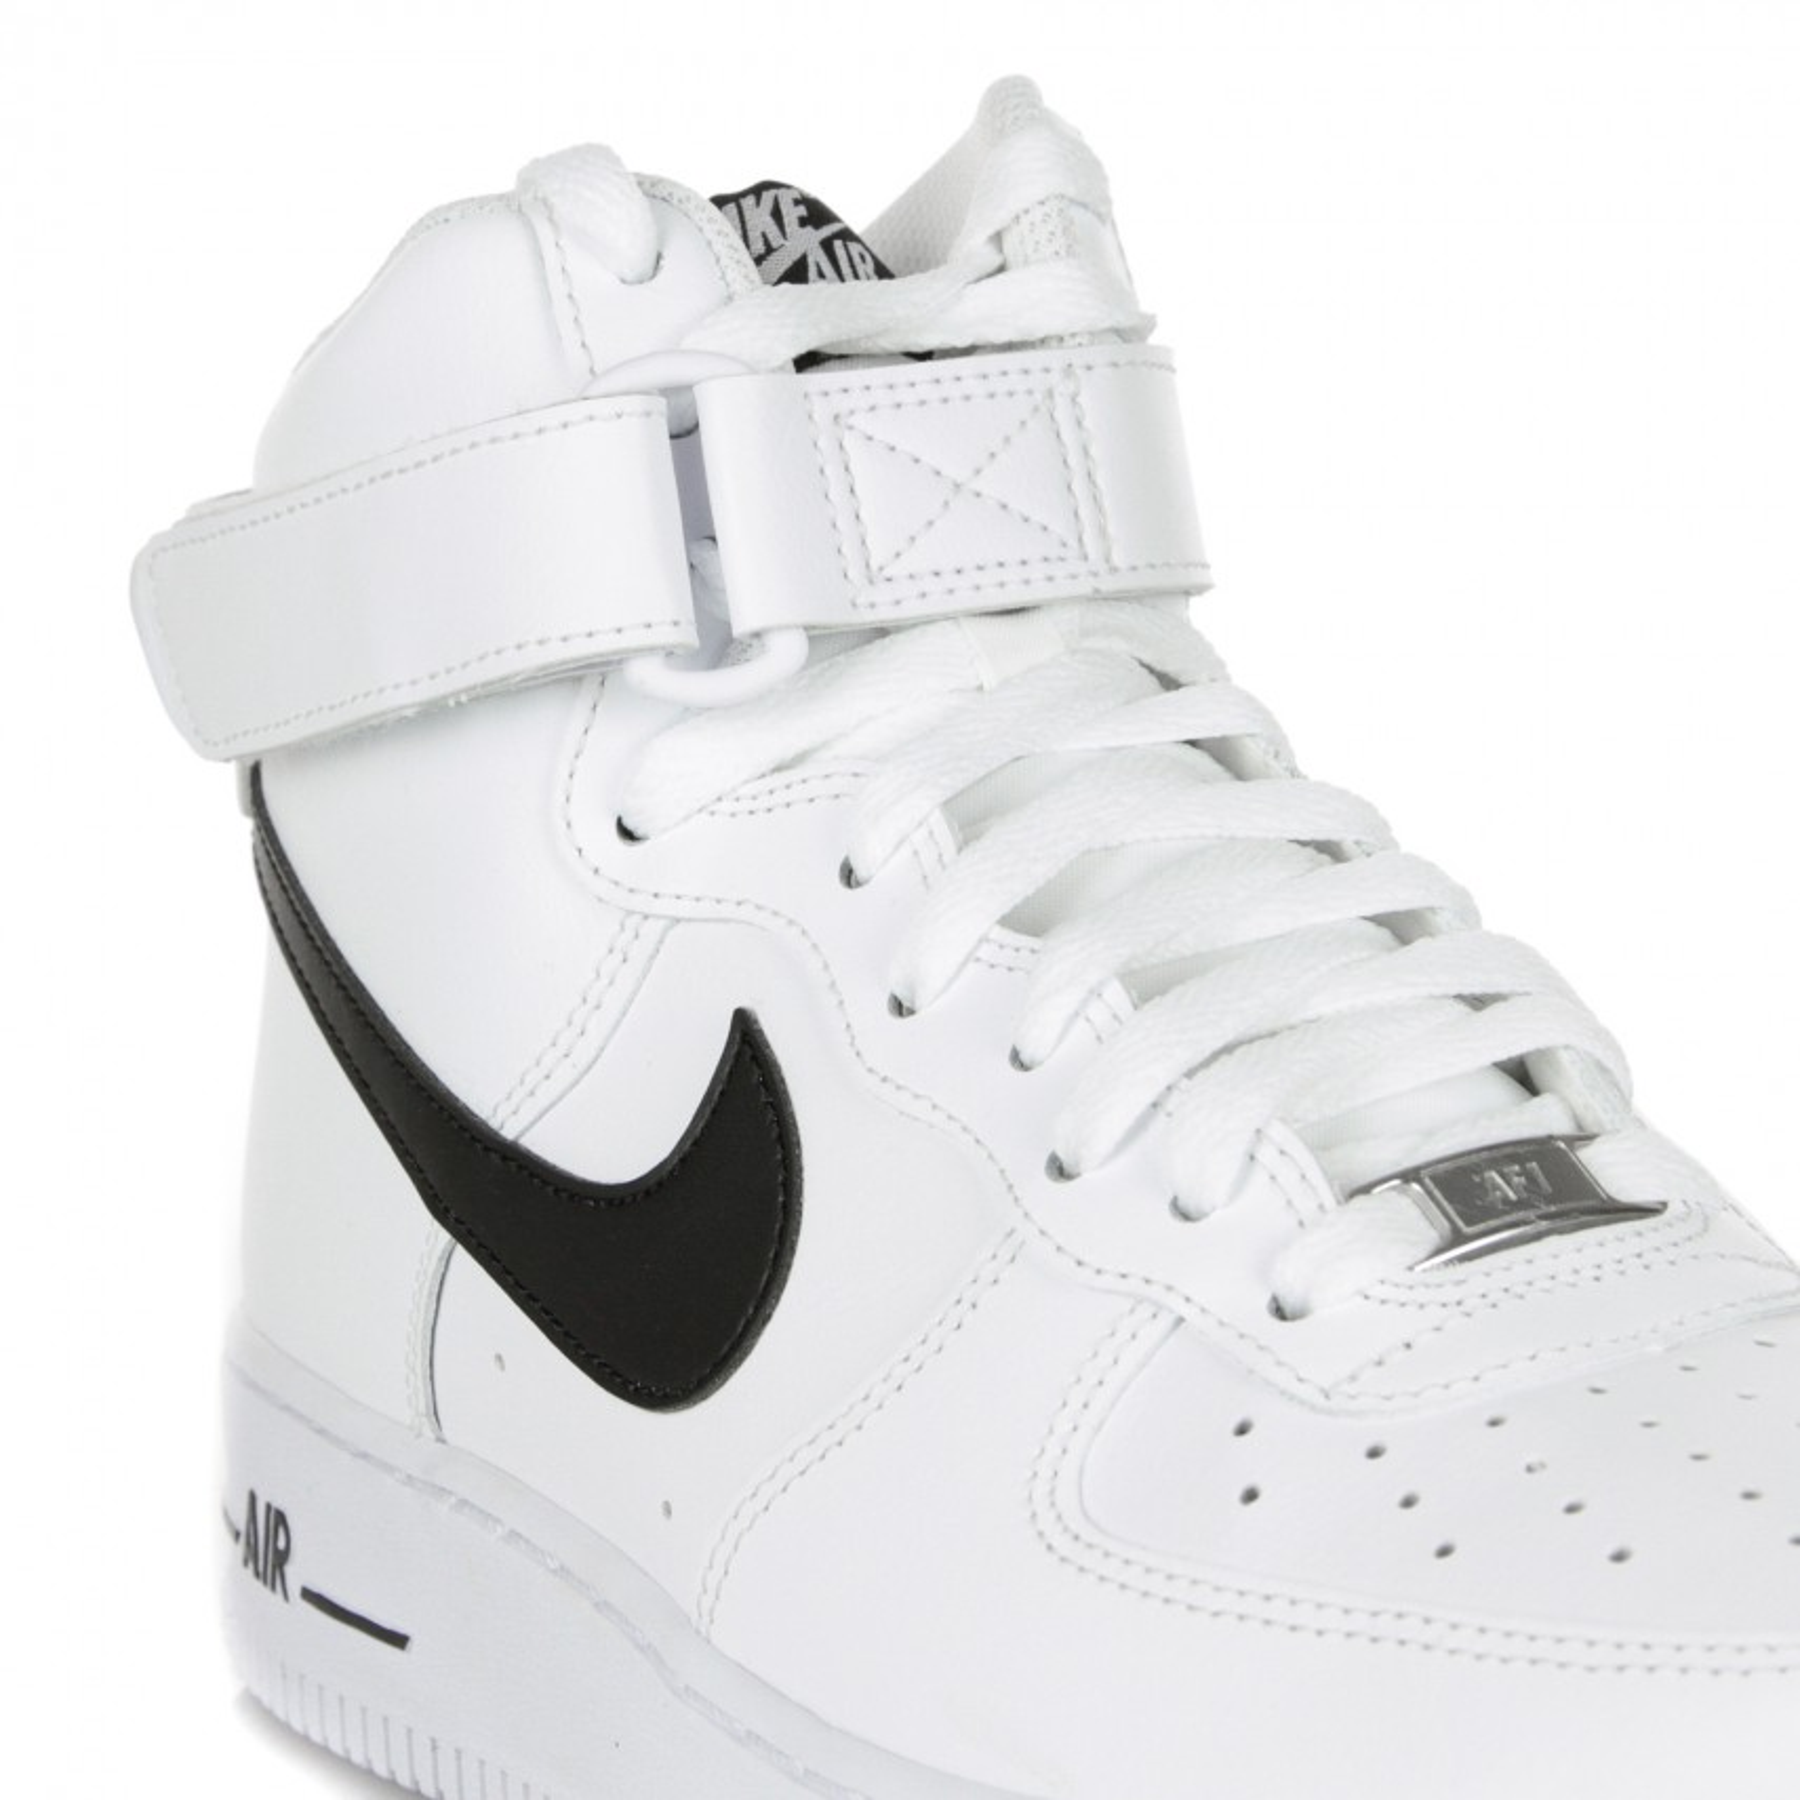 scarpa alta uomo air force 1 high 07 WHITE/BLACK